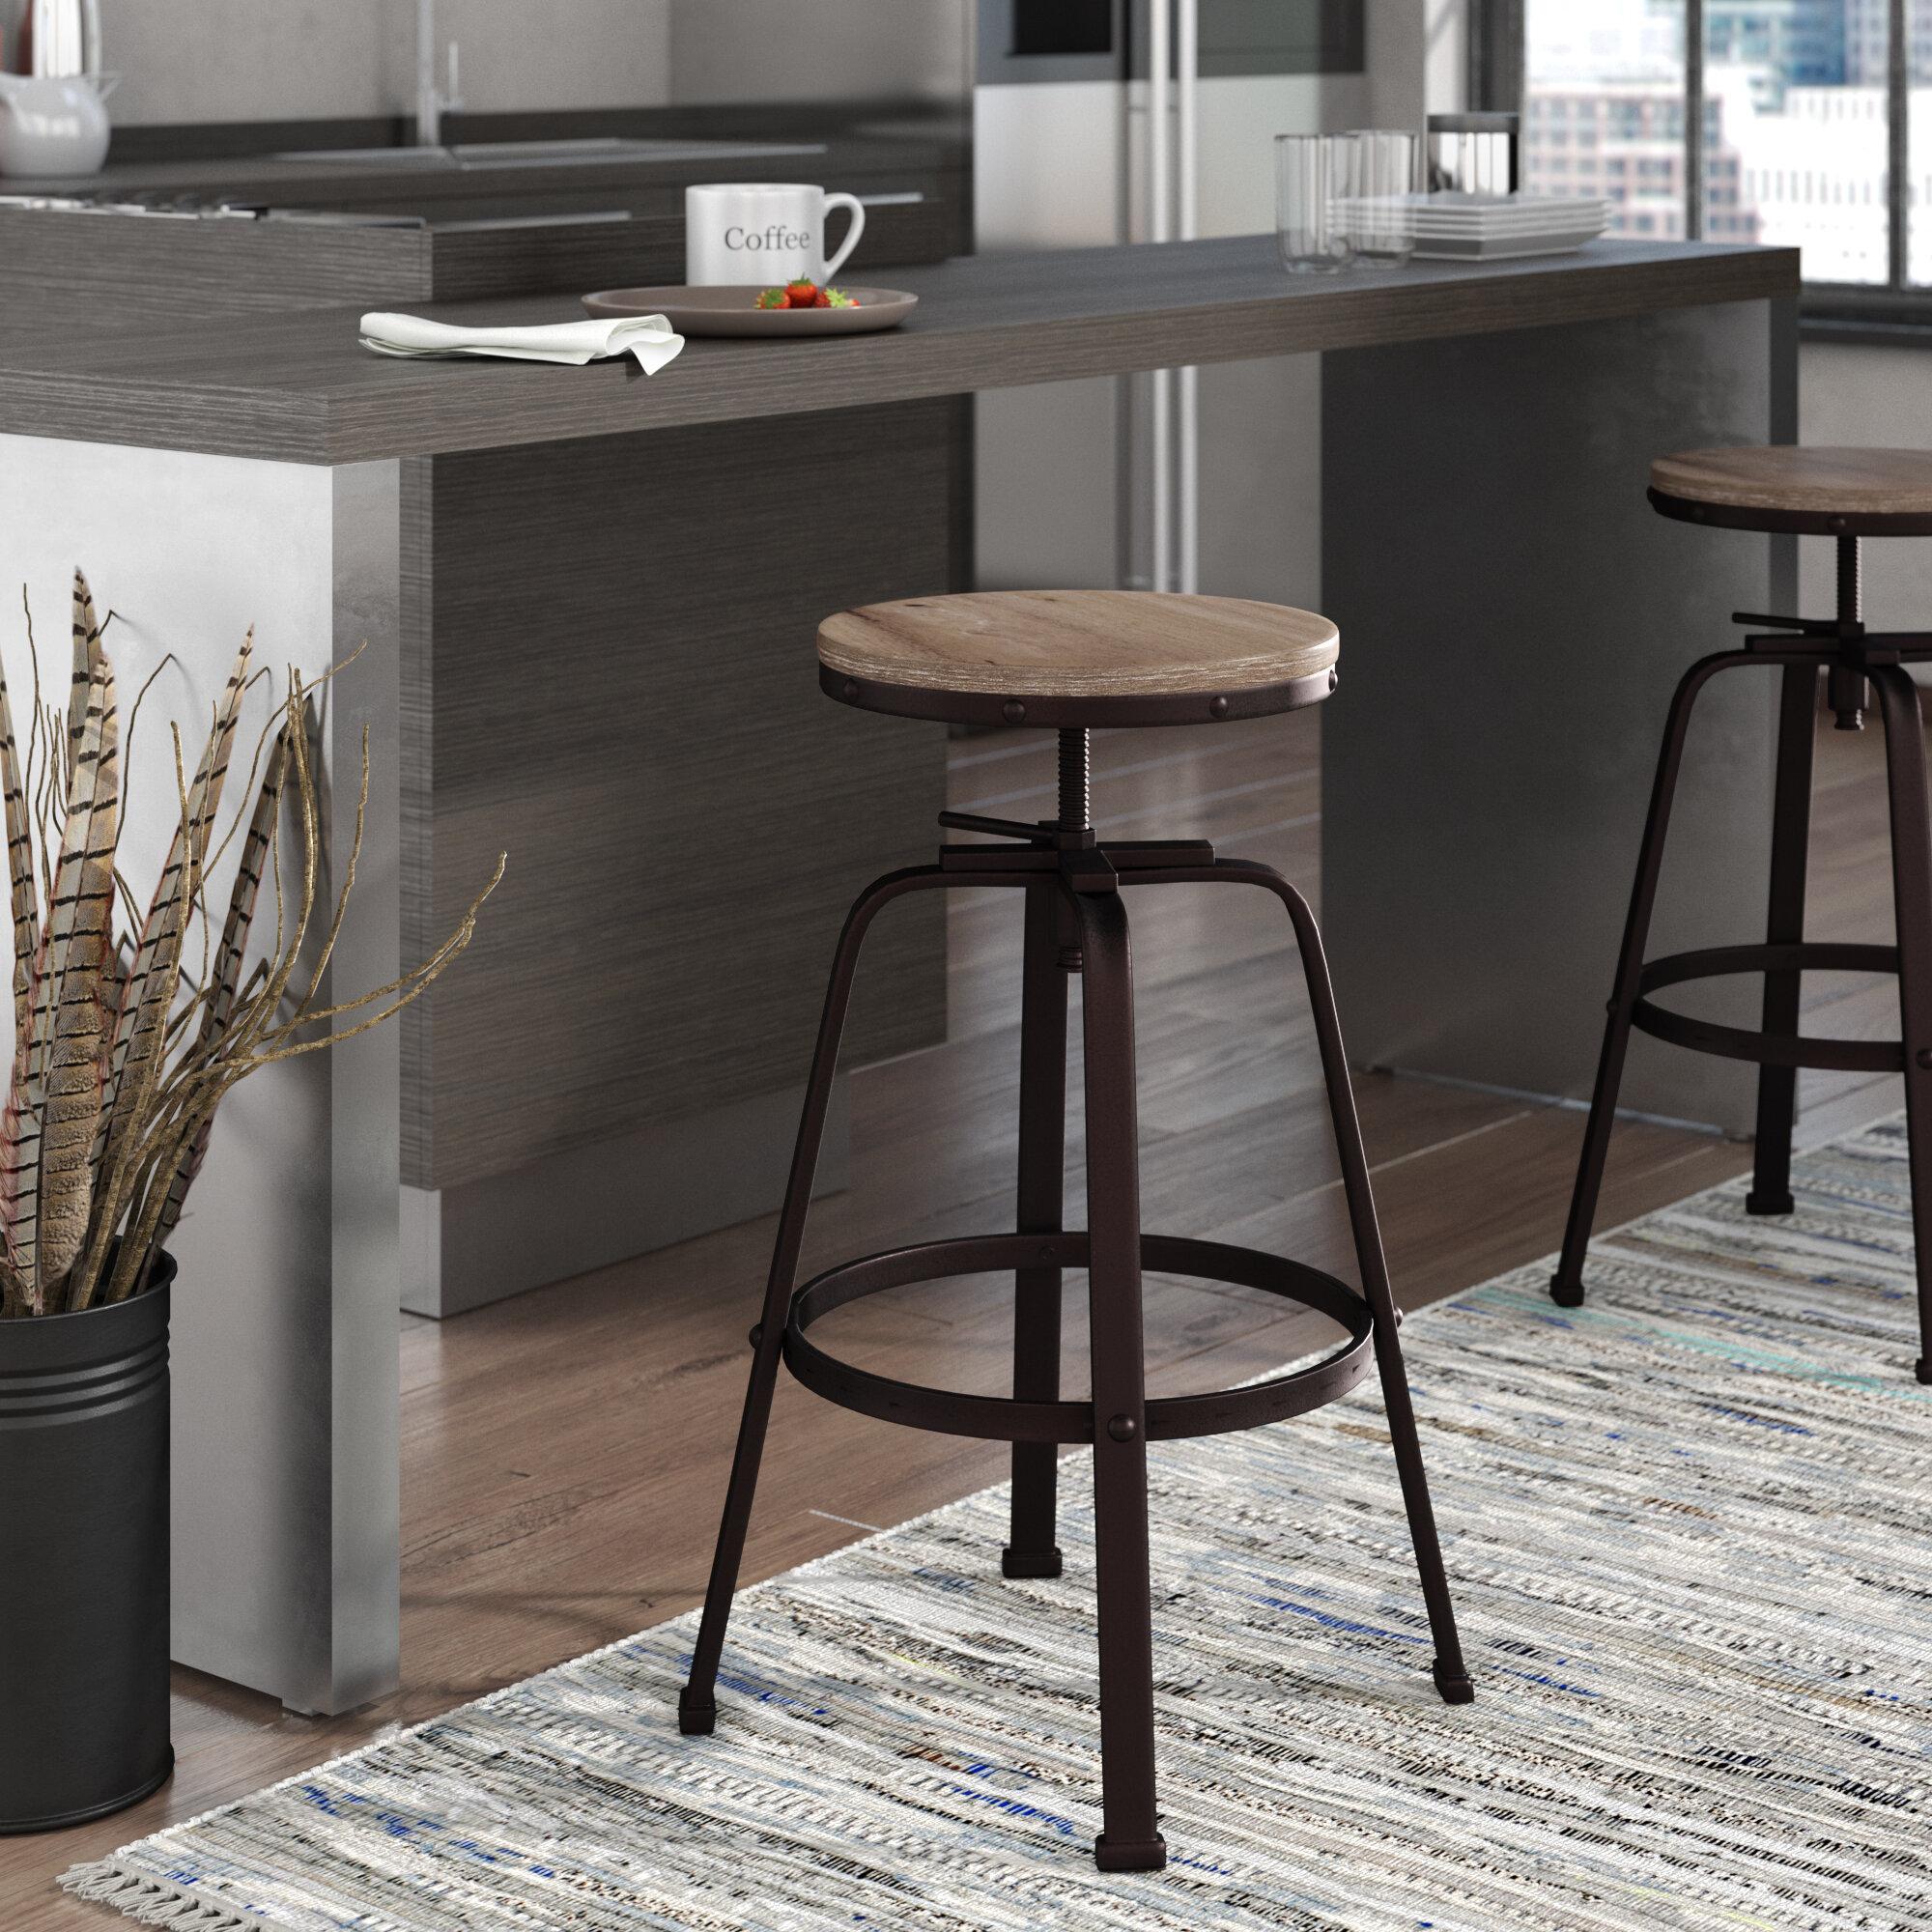 Wondrous Mullings Adjustable Height Bar Stool Gamerscity Chair Design For Home Gamerscityorg